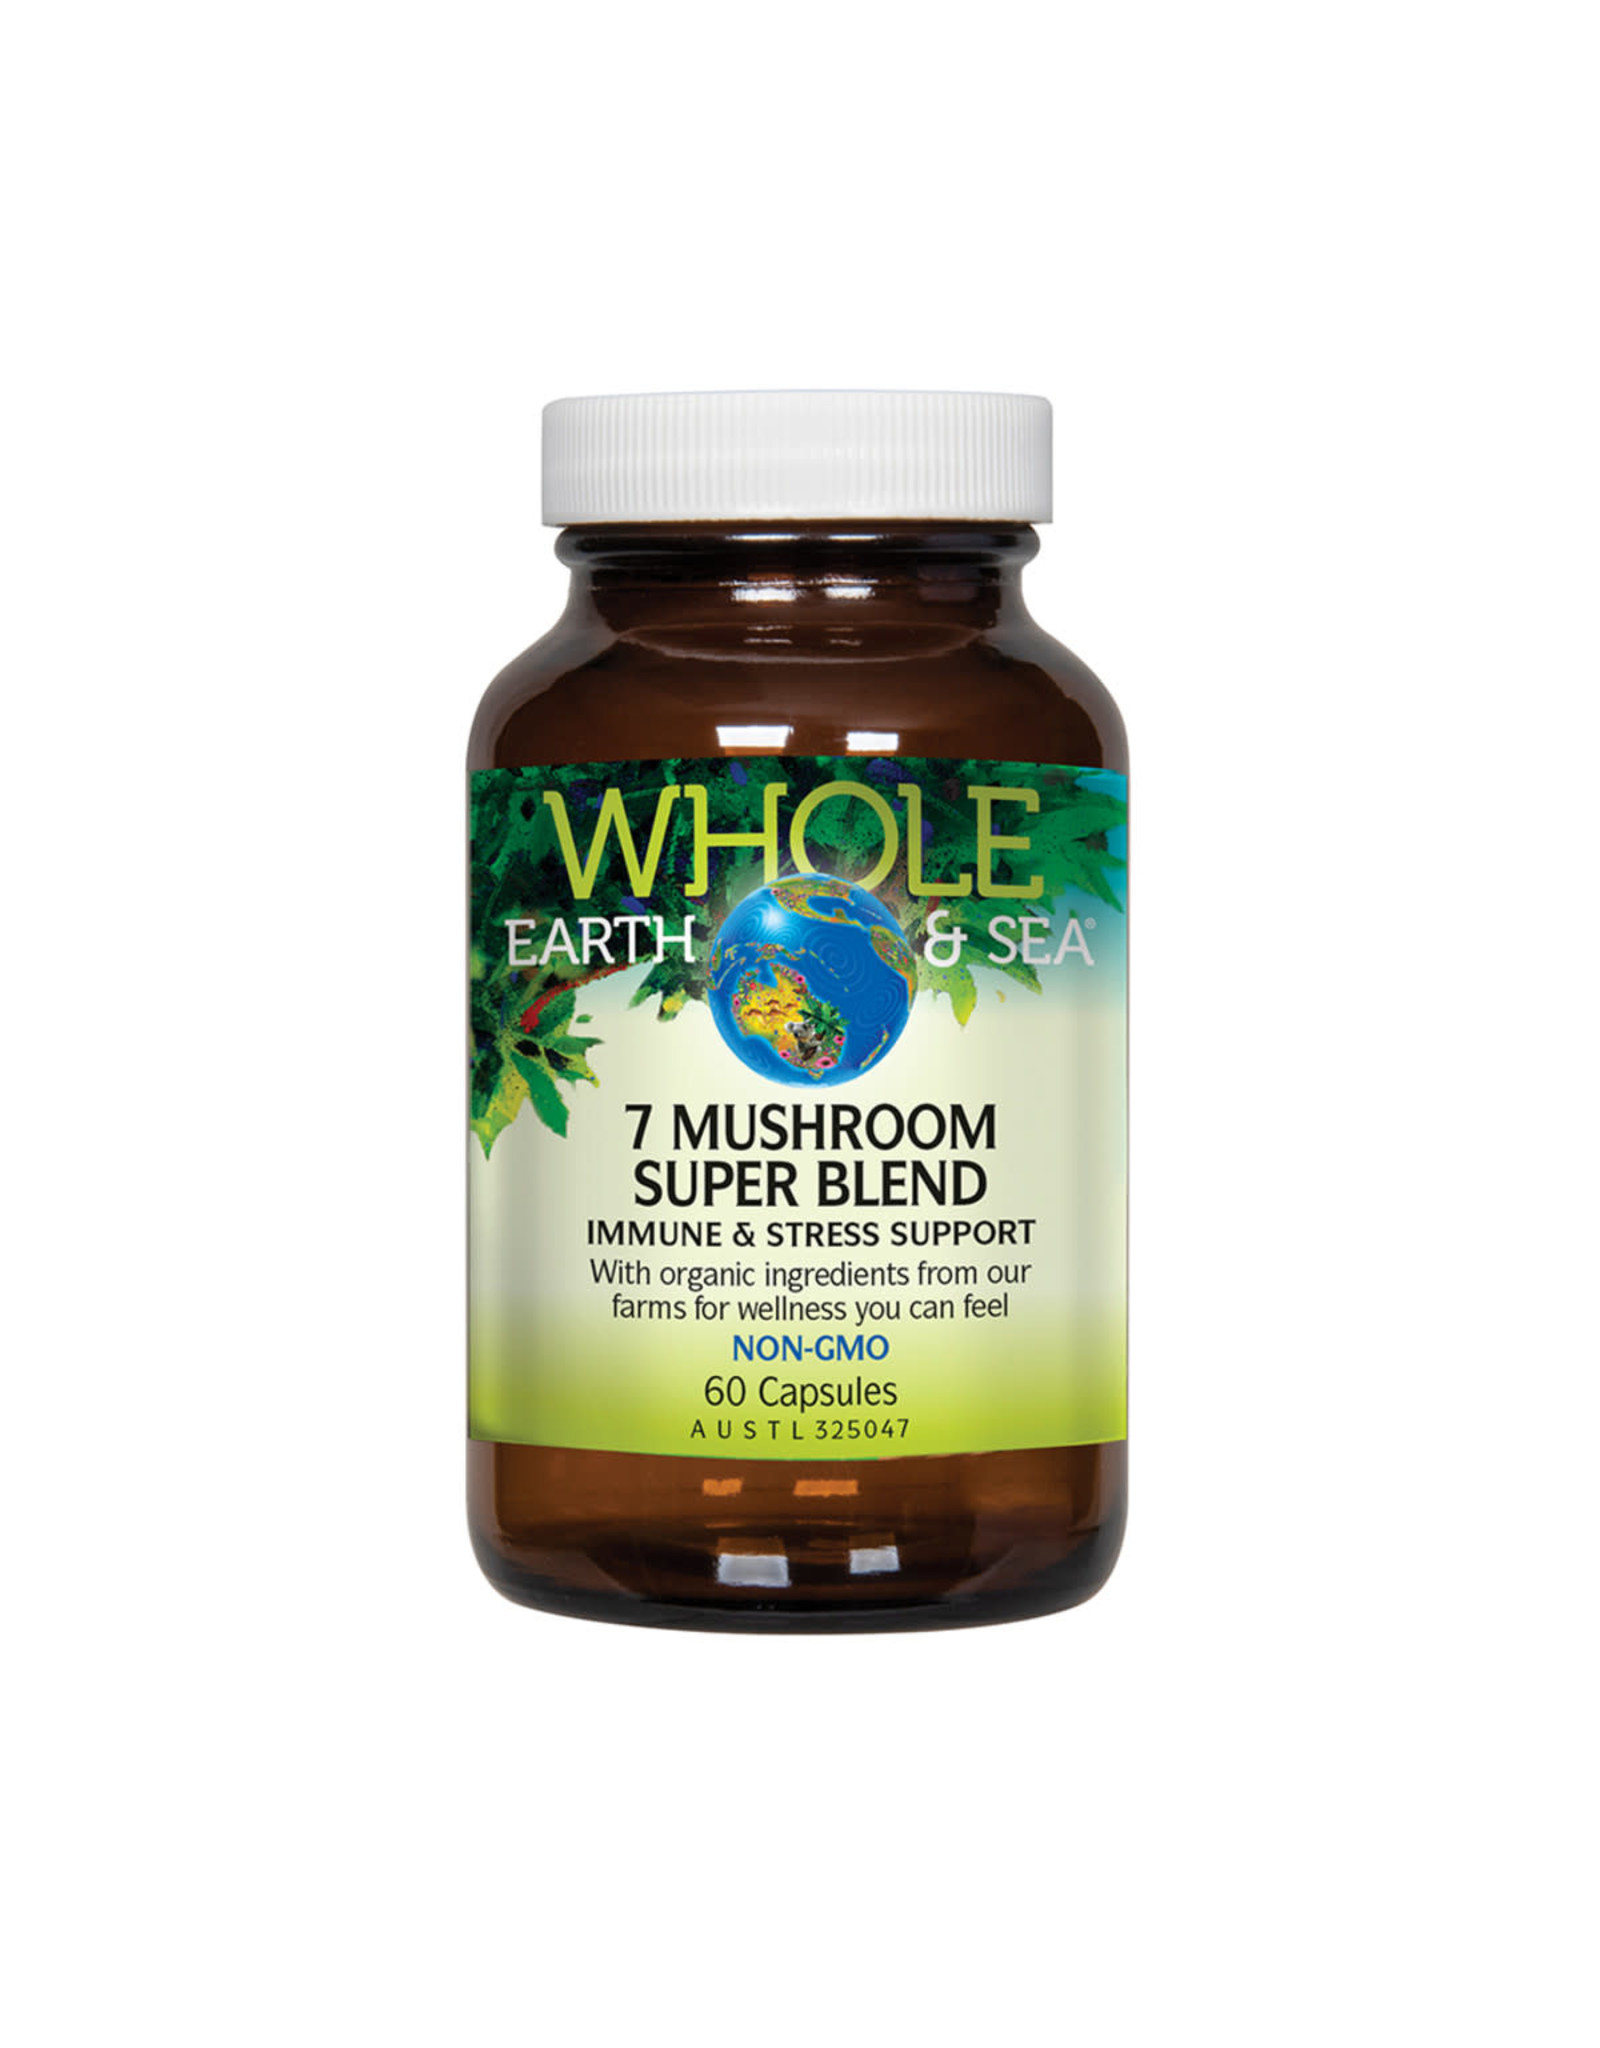 Whole Earth & Sea 7 Mushroom Super Blend 60c